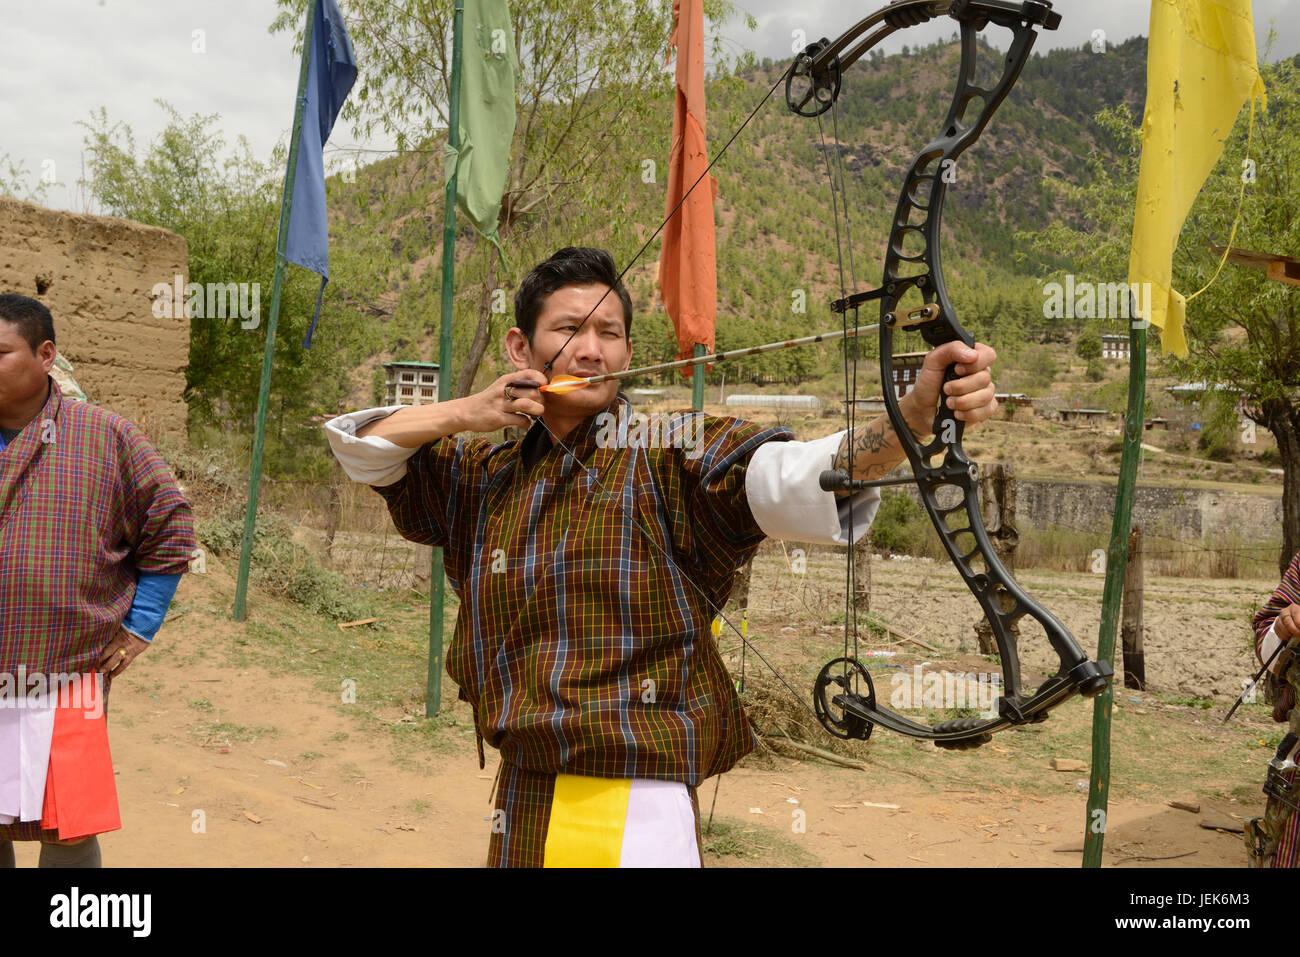 Man practicing national sport of archery, Thimphu, Bhutan, asia - Stock Image